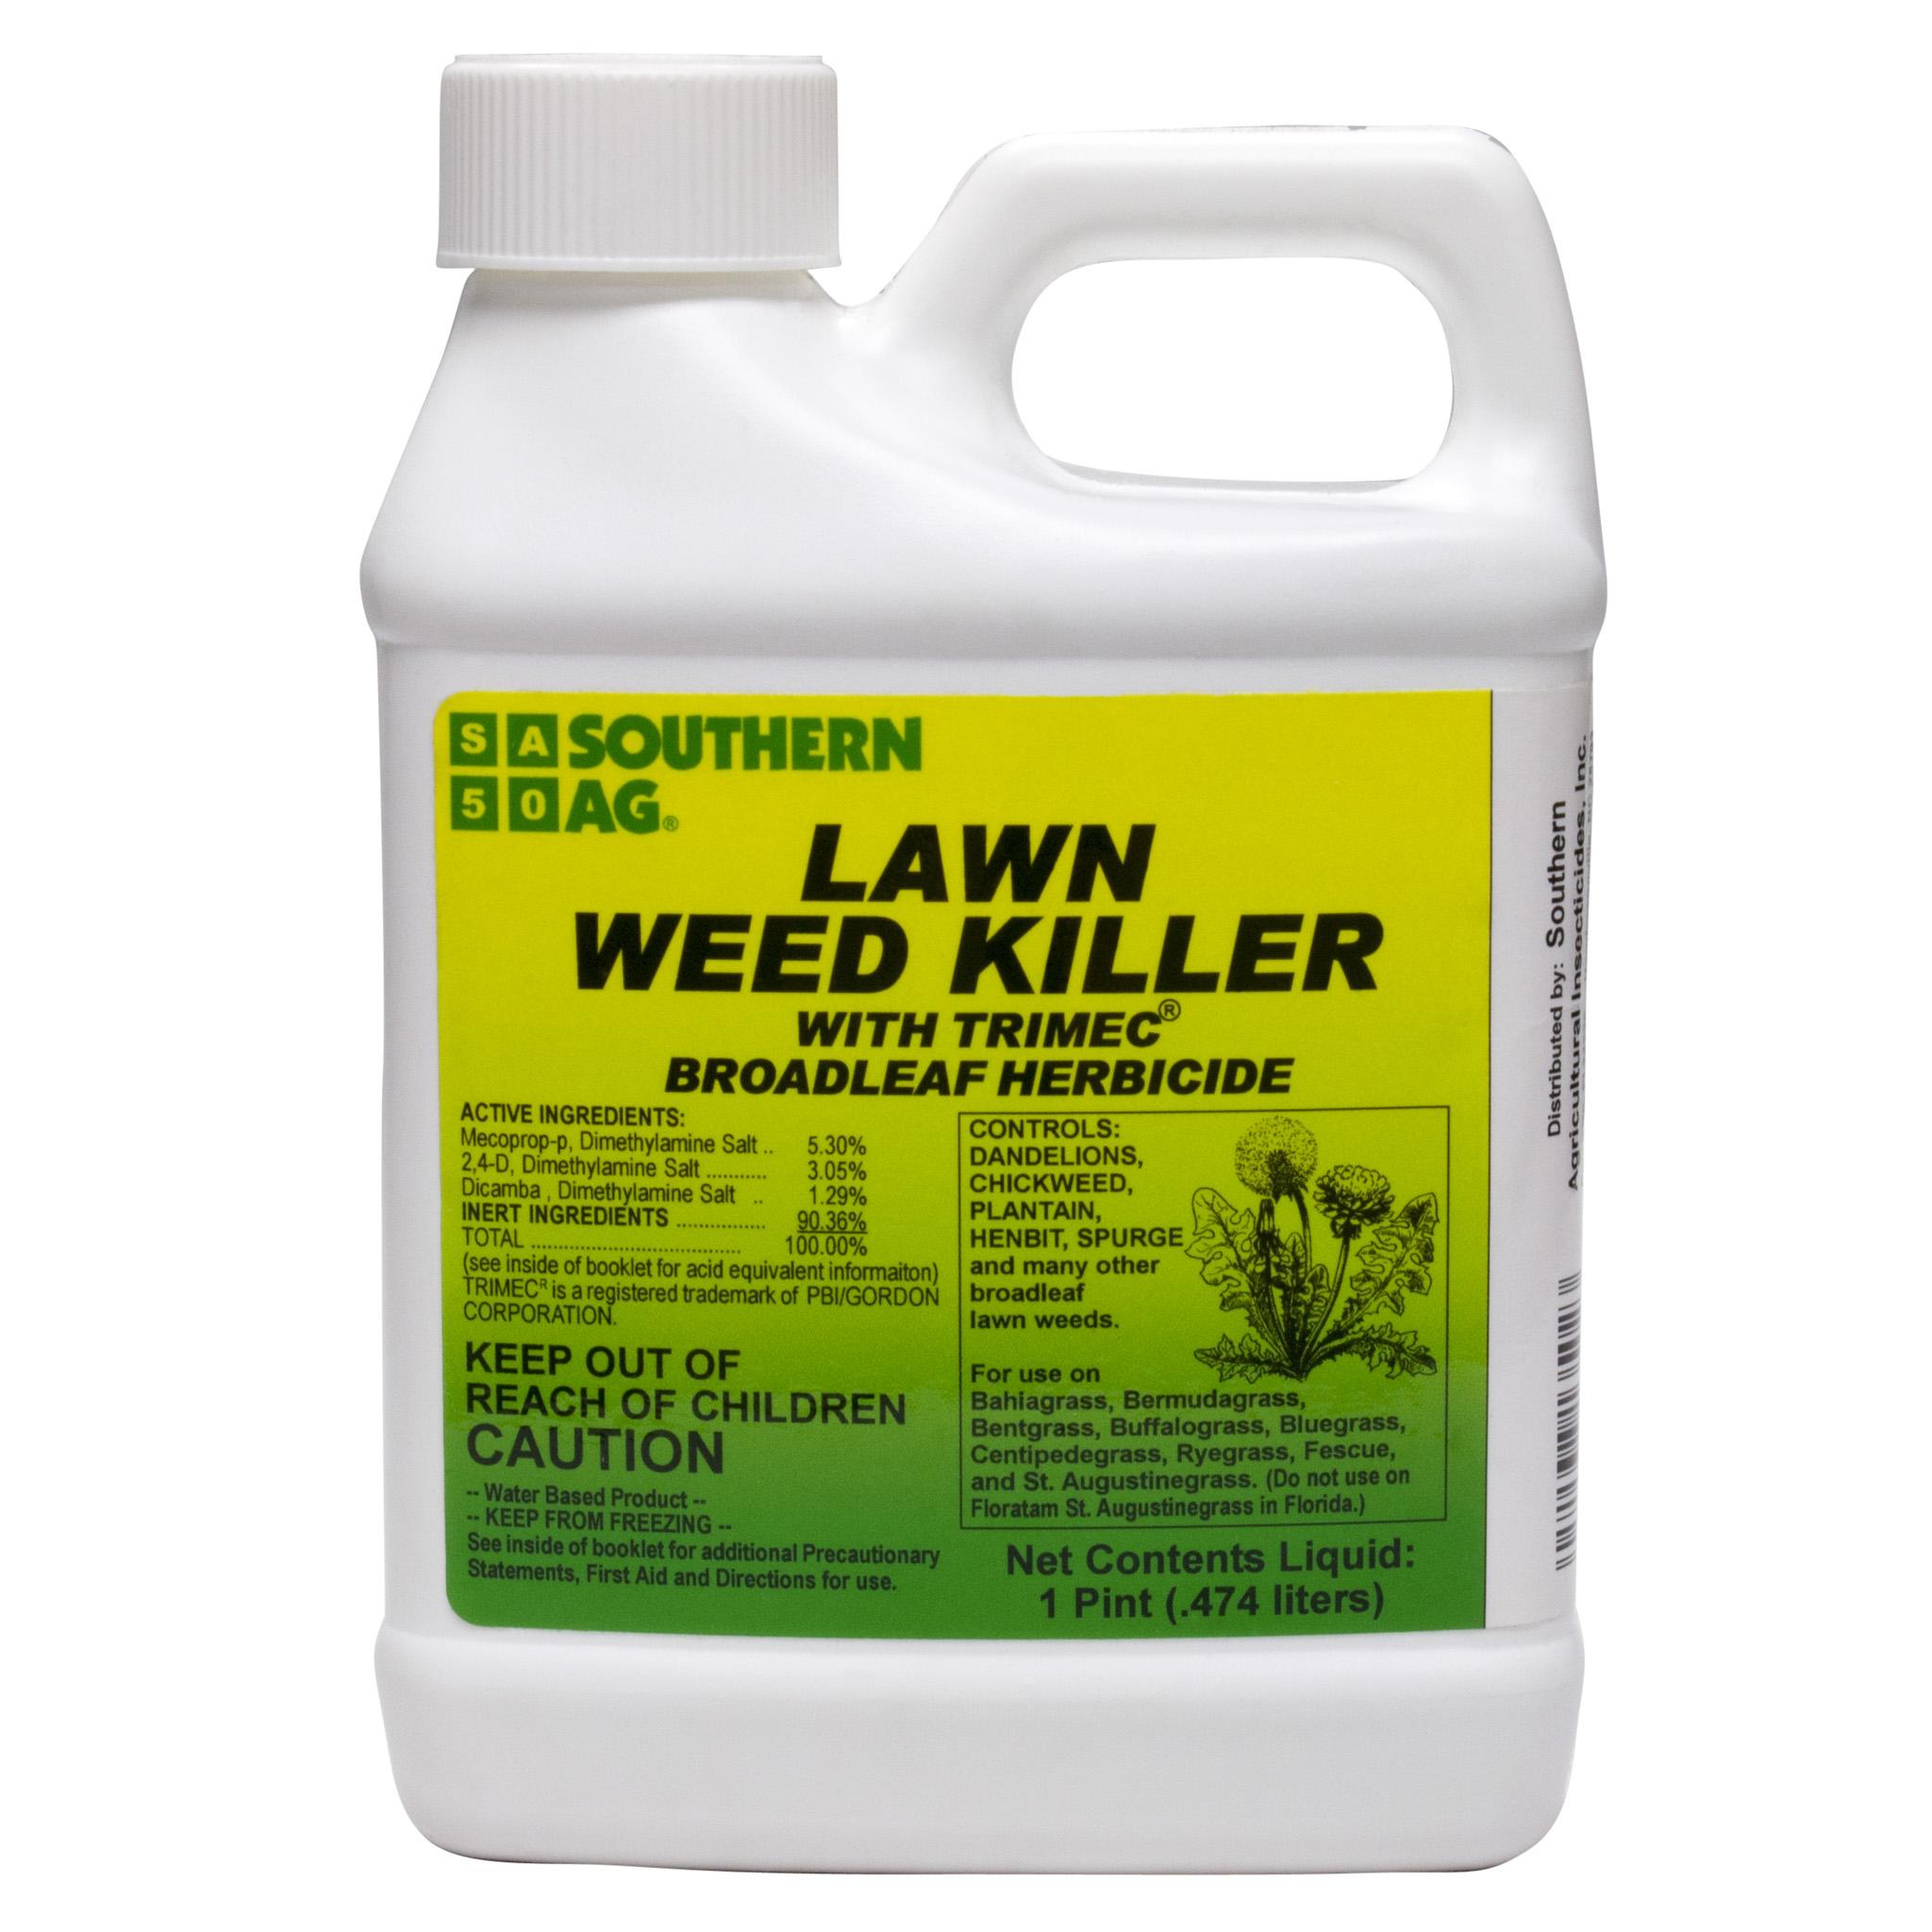 southern ag lawn weed killer with trimec ebay. Black Bedroom Furniture Sets. Home Design Ideas